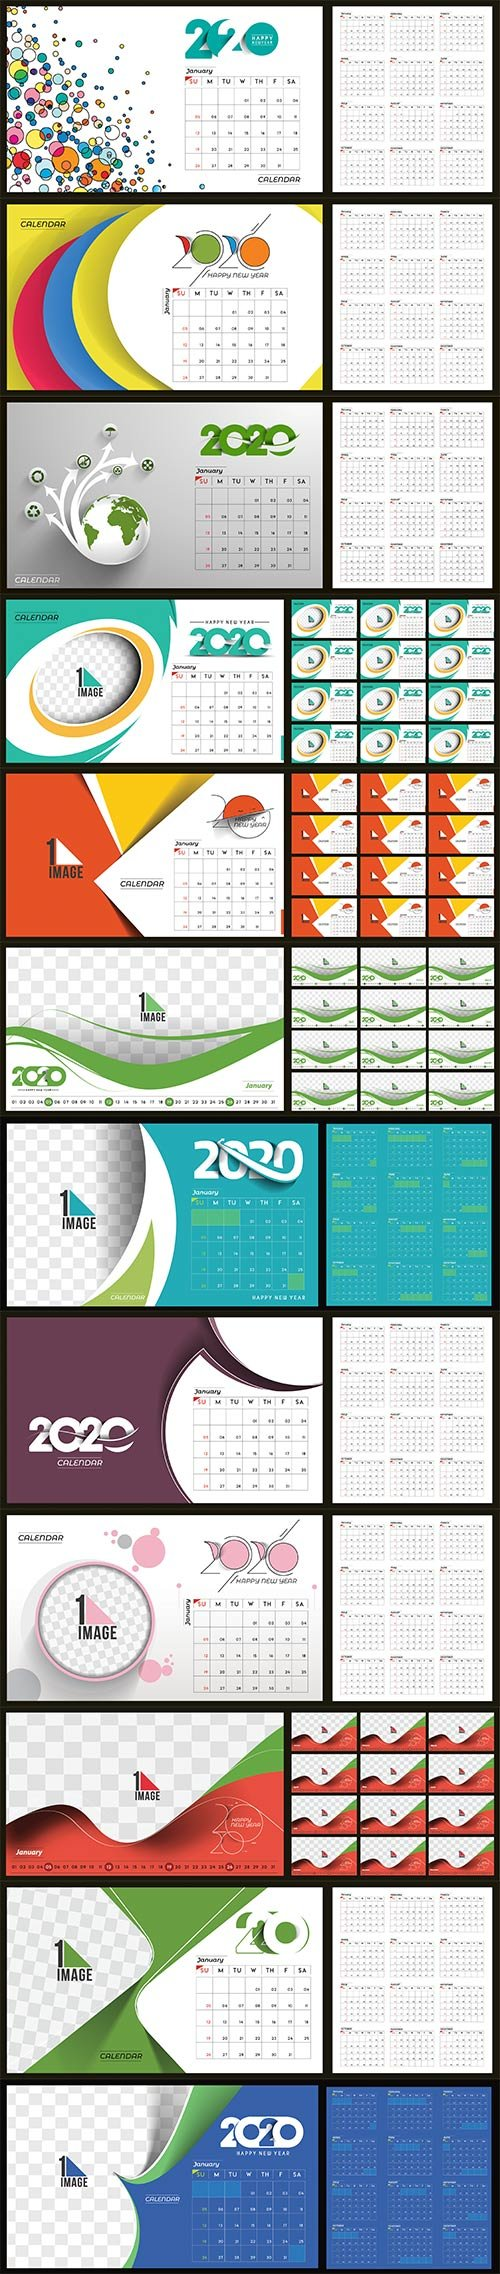 Happy new year 2020 Calendar